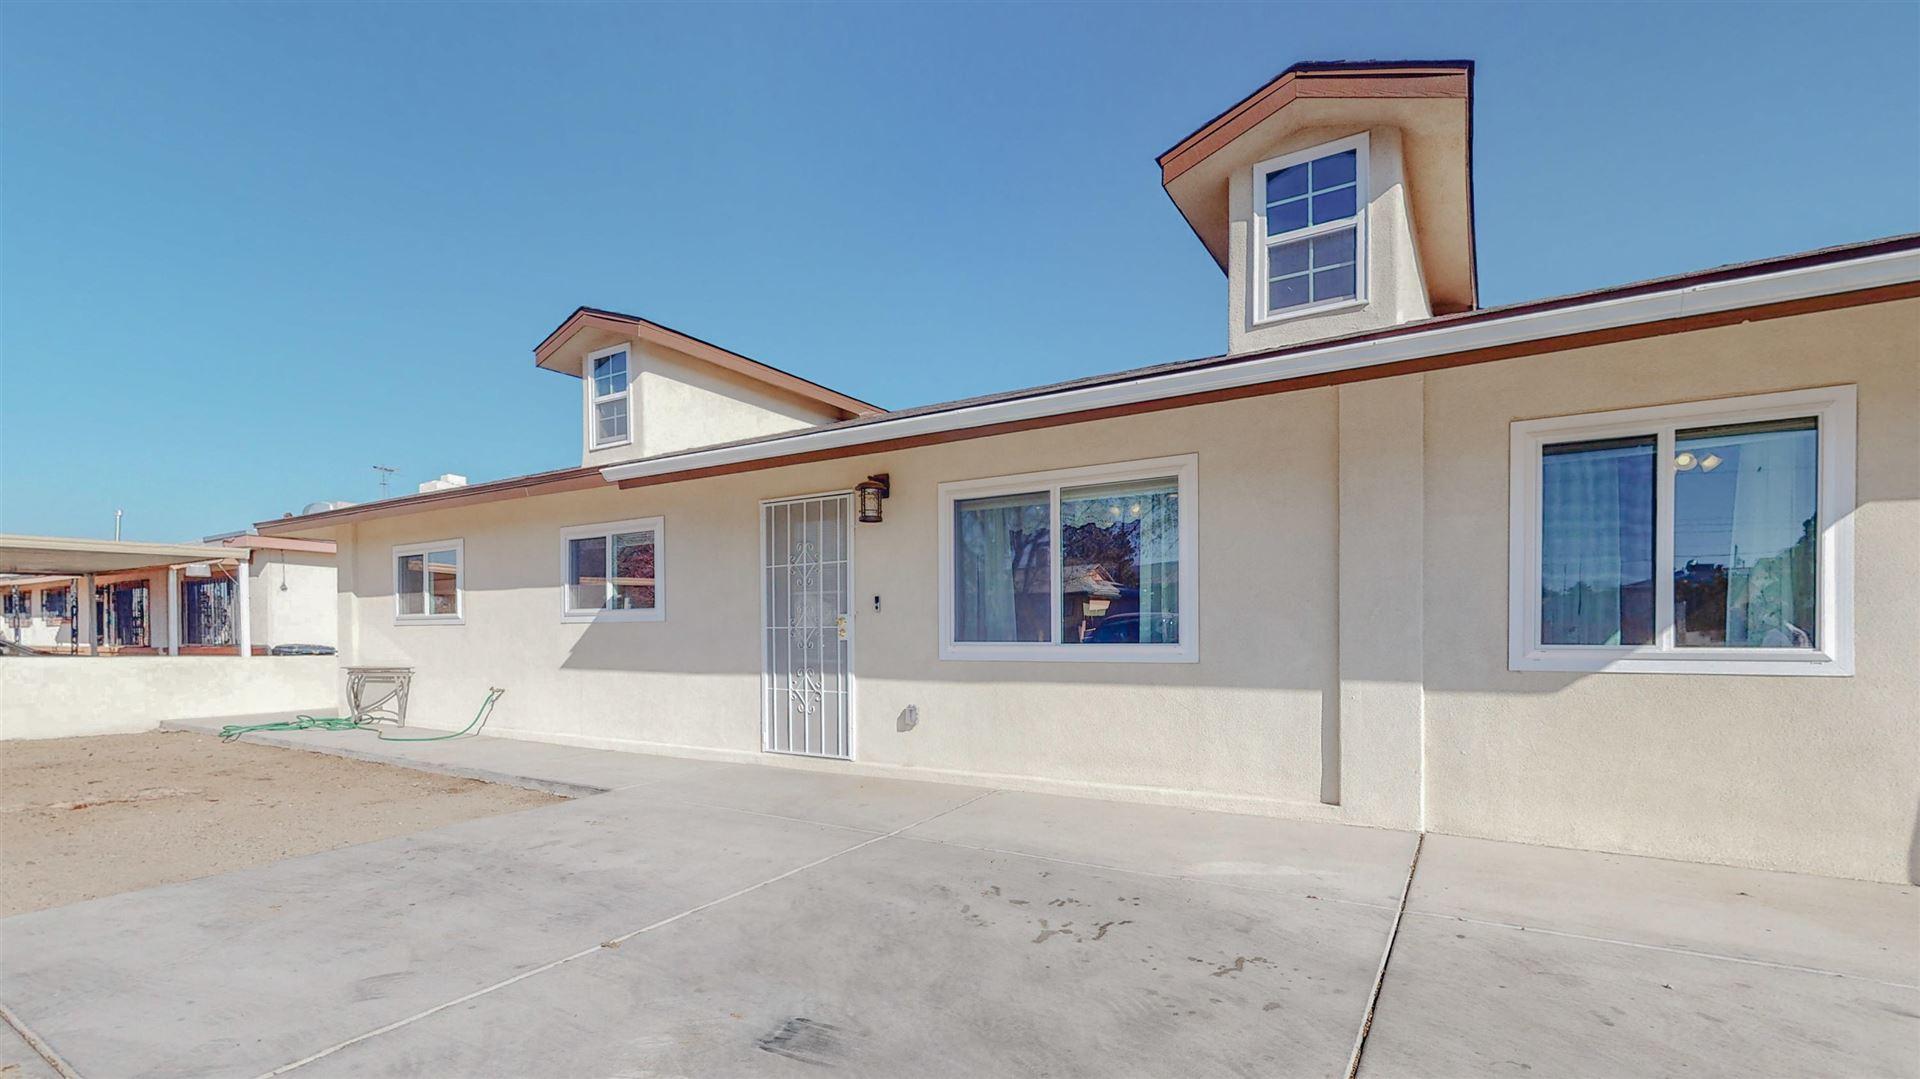 1112 DEL MONTE Trail SW, Albuquerque, NM 87121 - MLS#: 983784